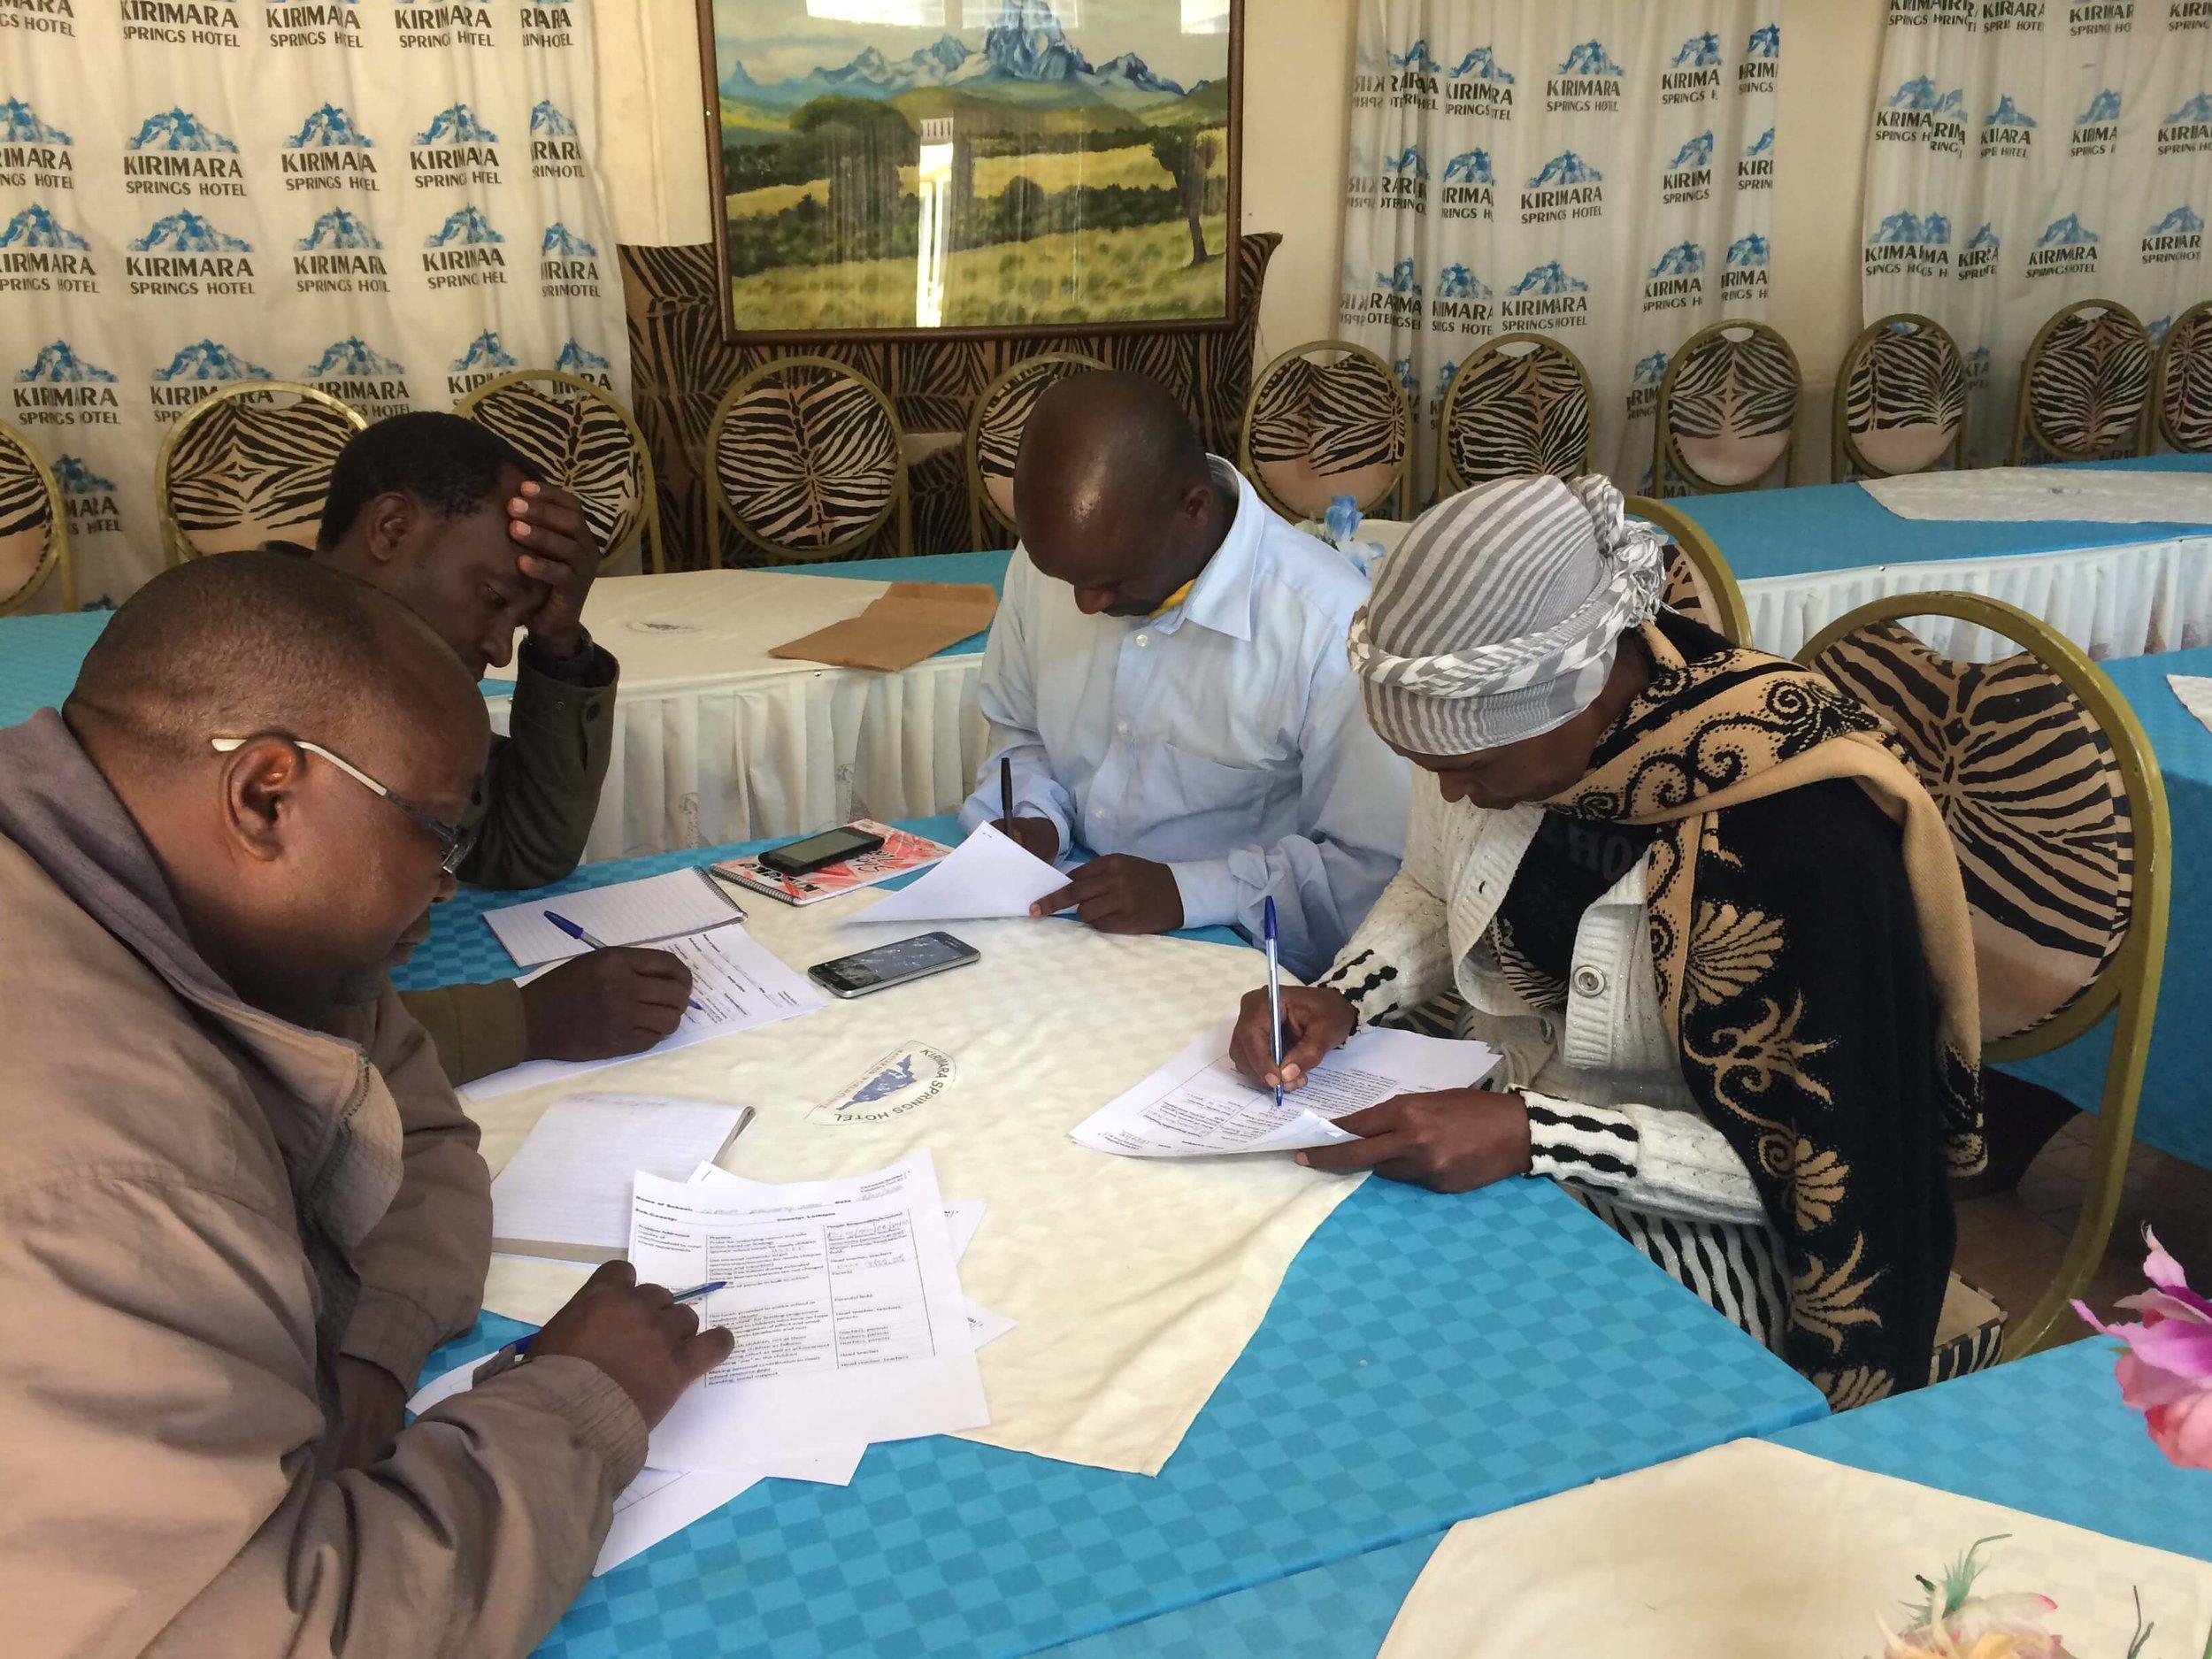 Laikipia Participants at Work.JPG